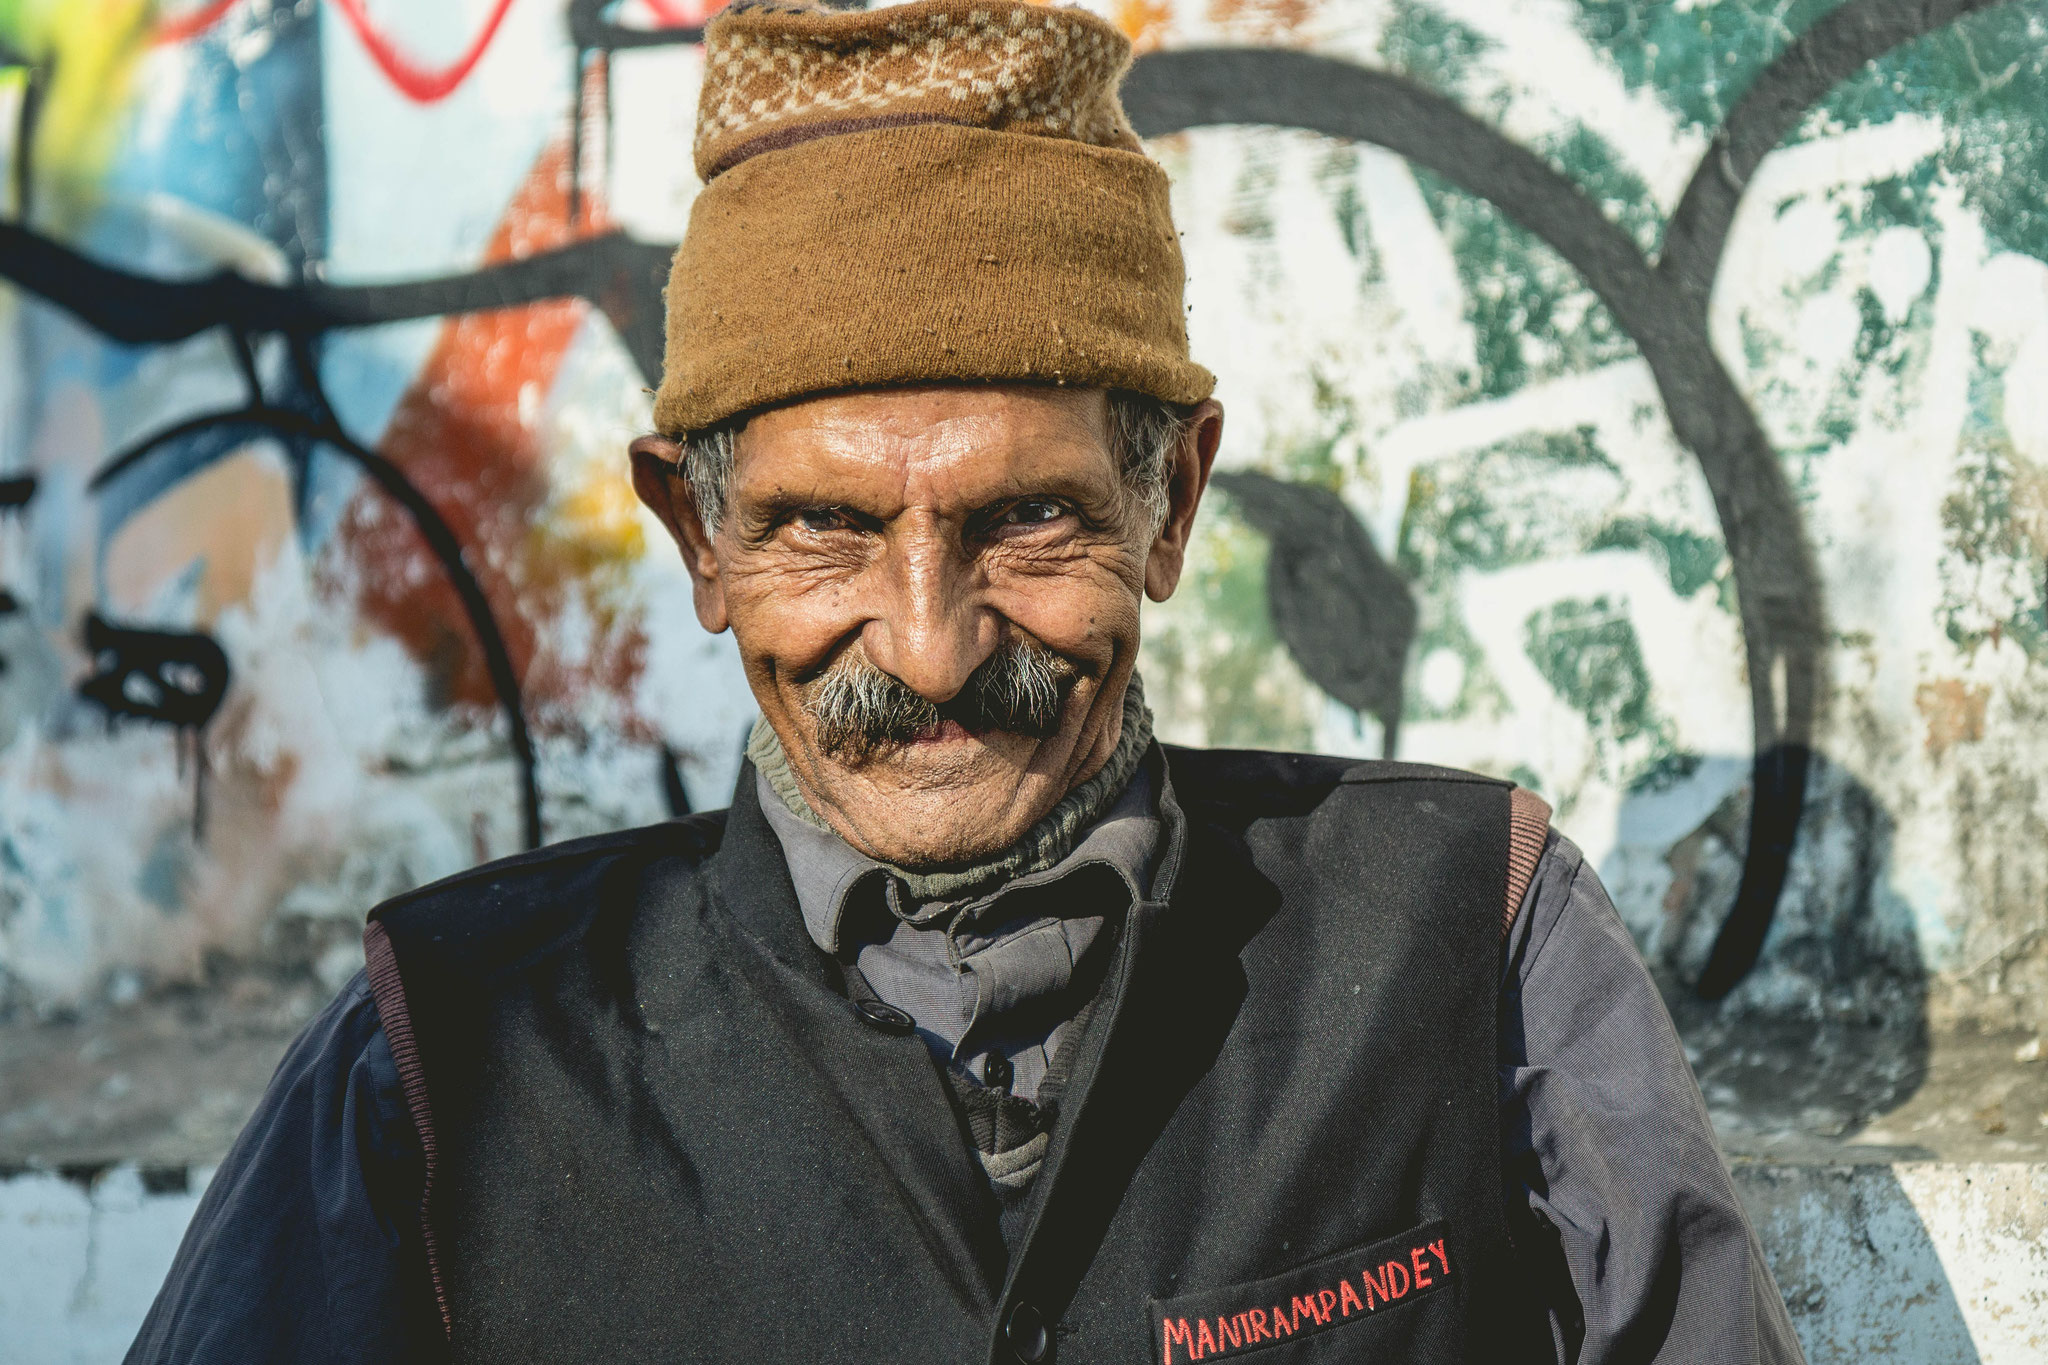 Manyram Pandey